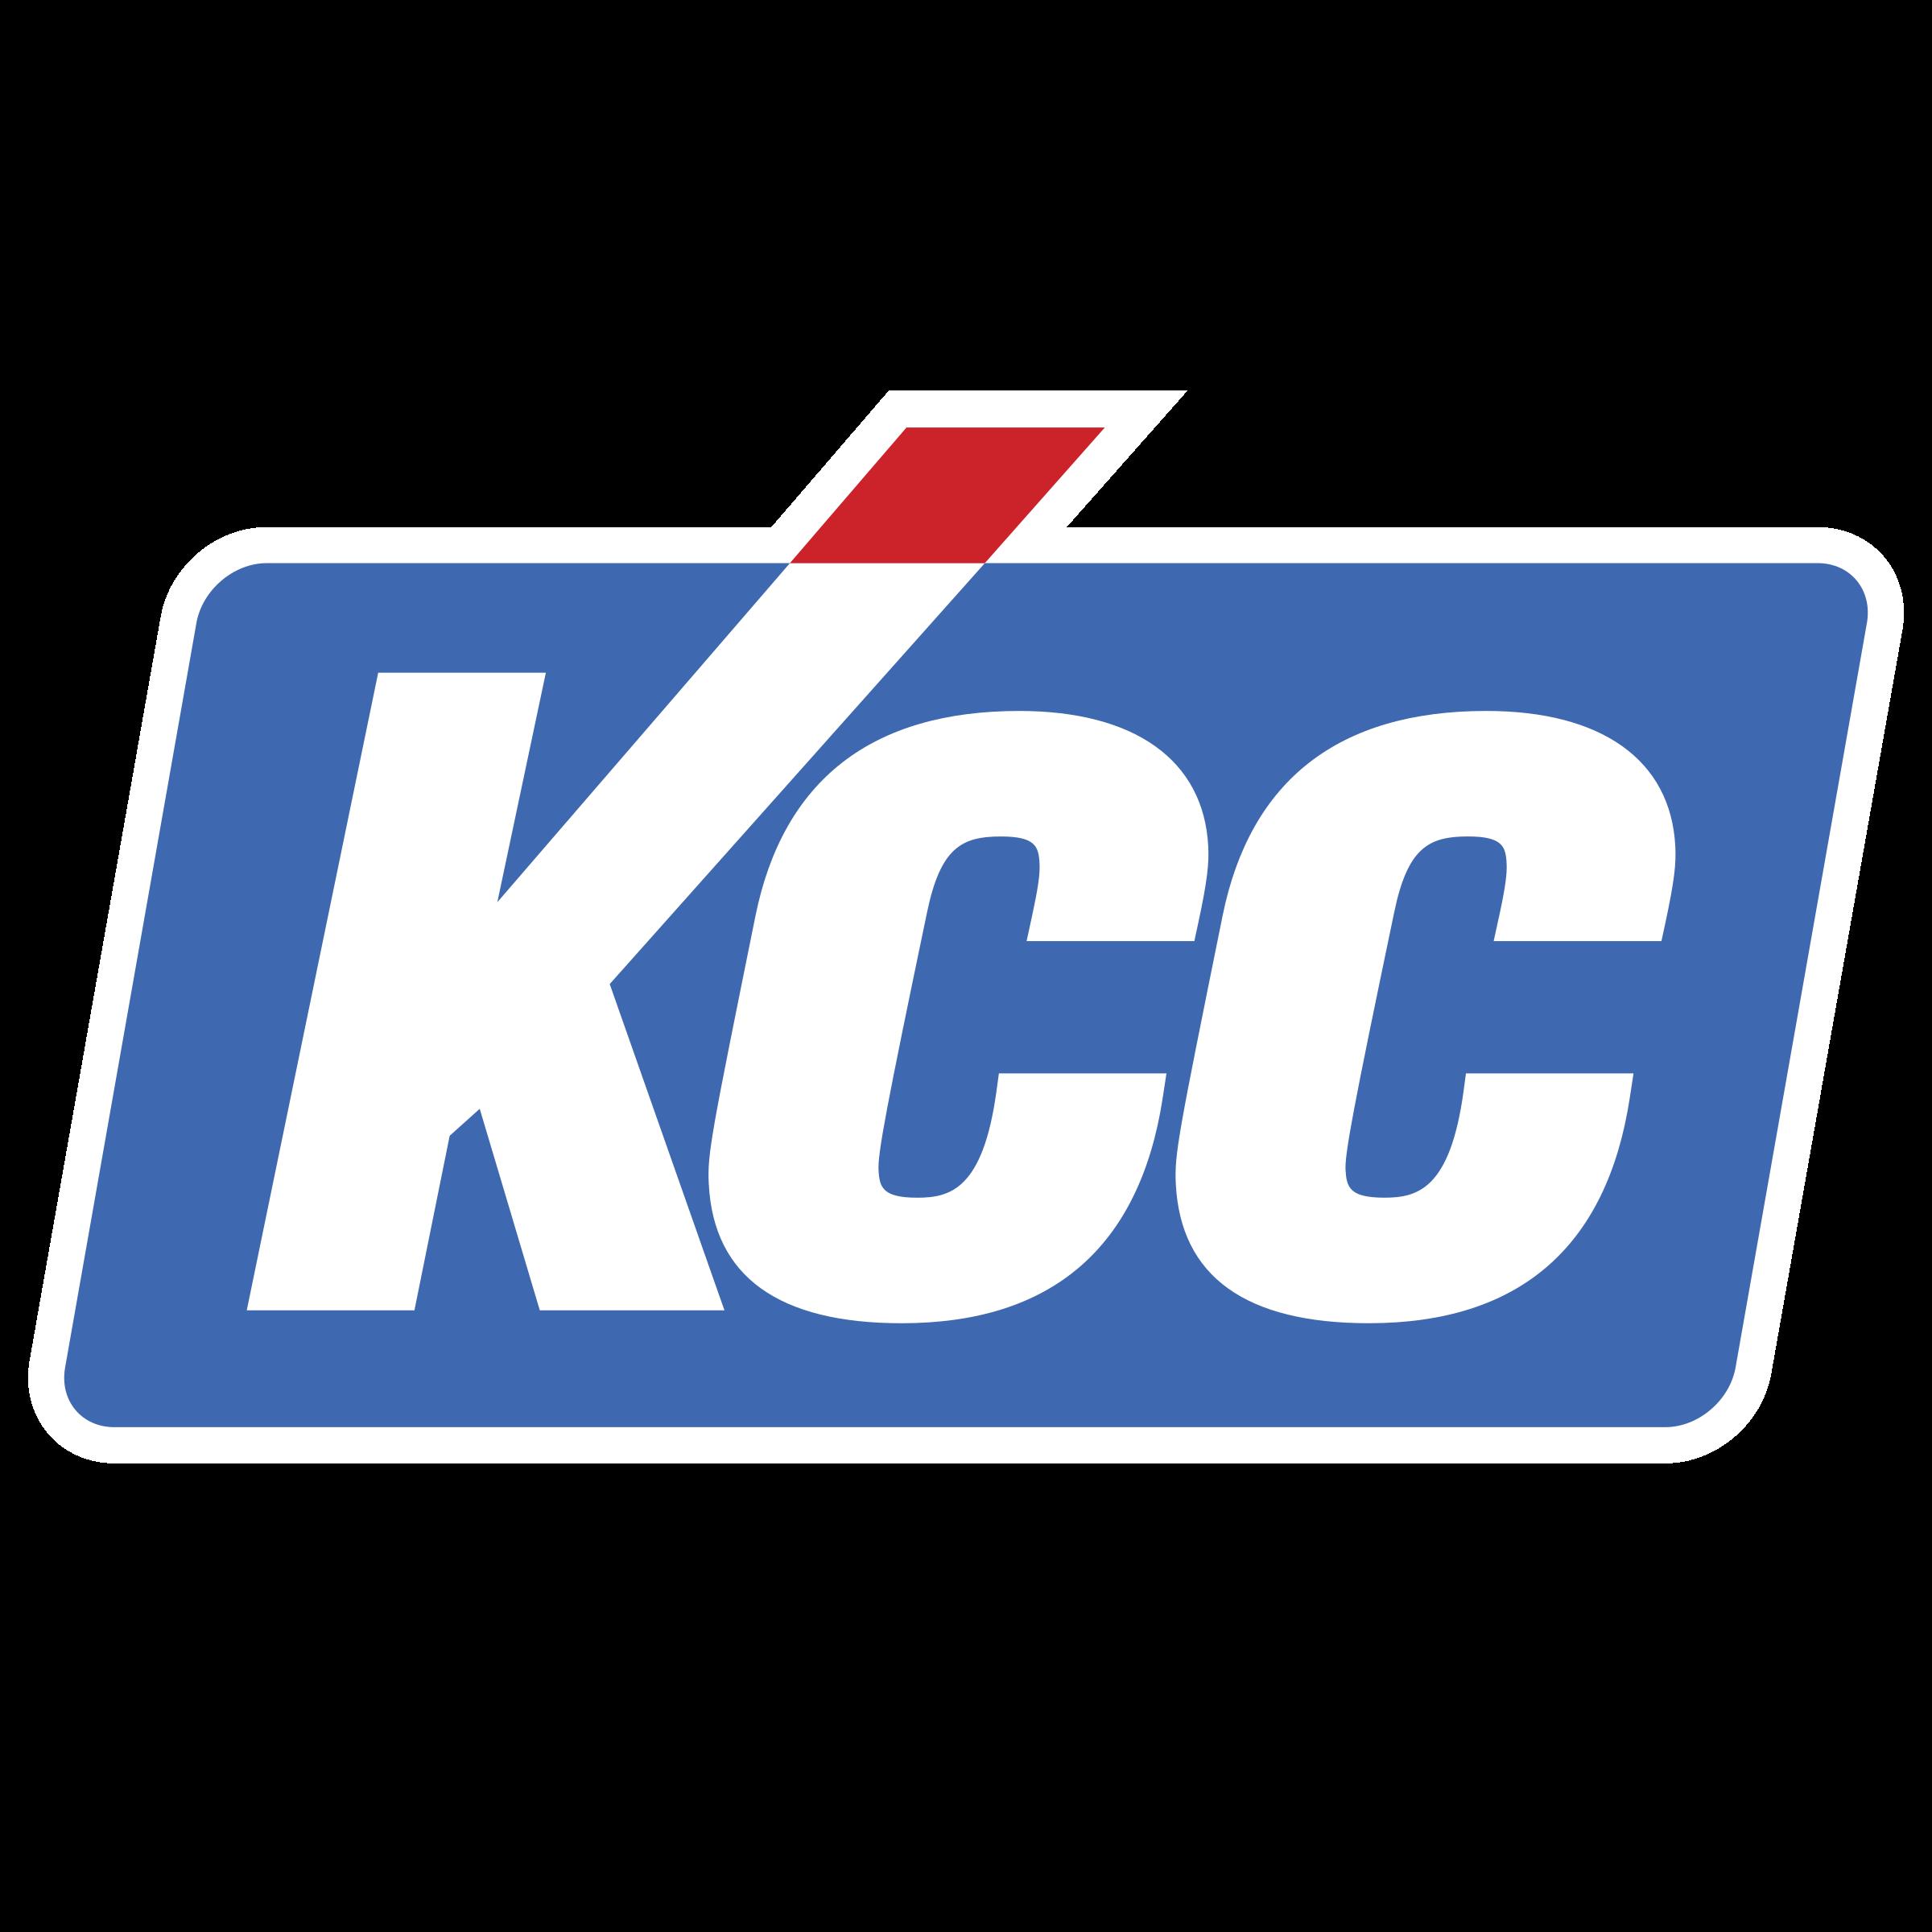 KCC Logo PNG Transparent & SVG Vector.